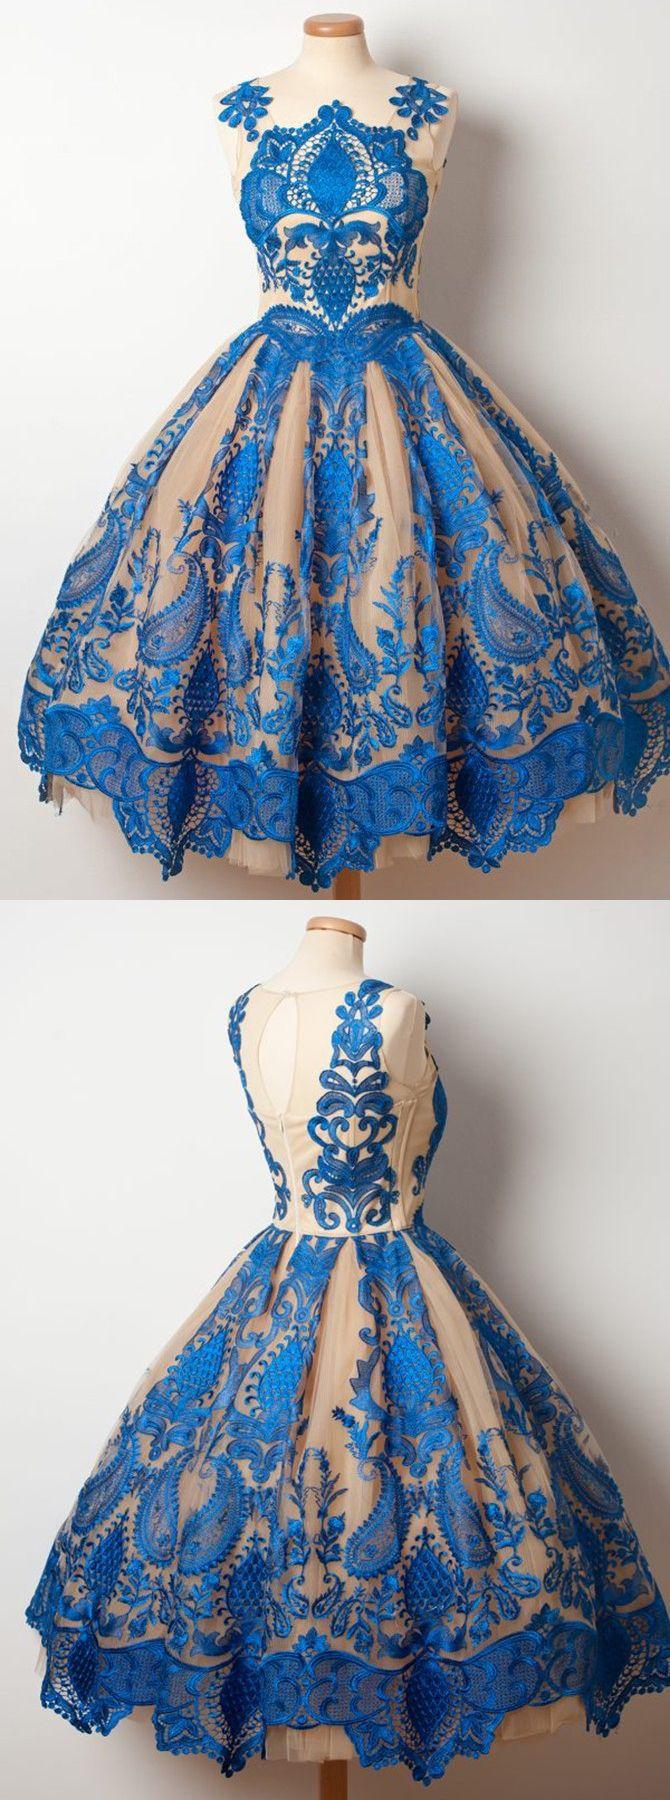 vintage homecoming dresses,1950s dresses,royal bue homecoming dresses,lace homecoming dresses,ball gown homecoming dresses